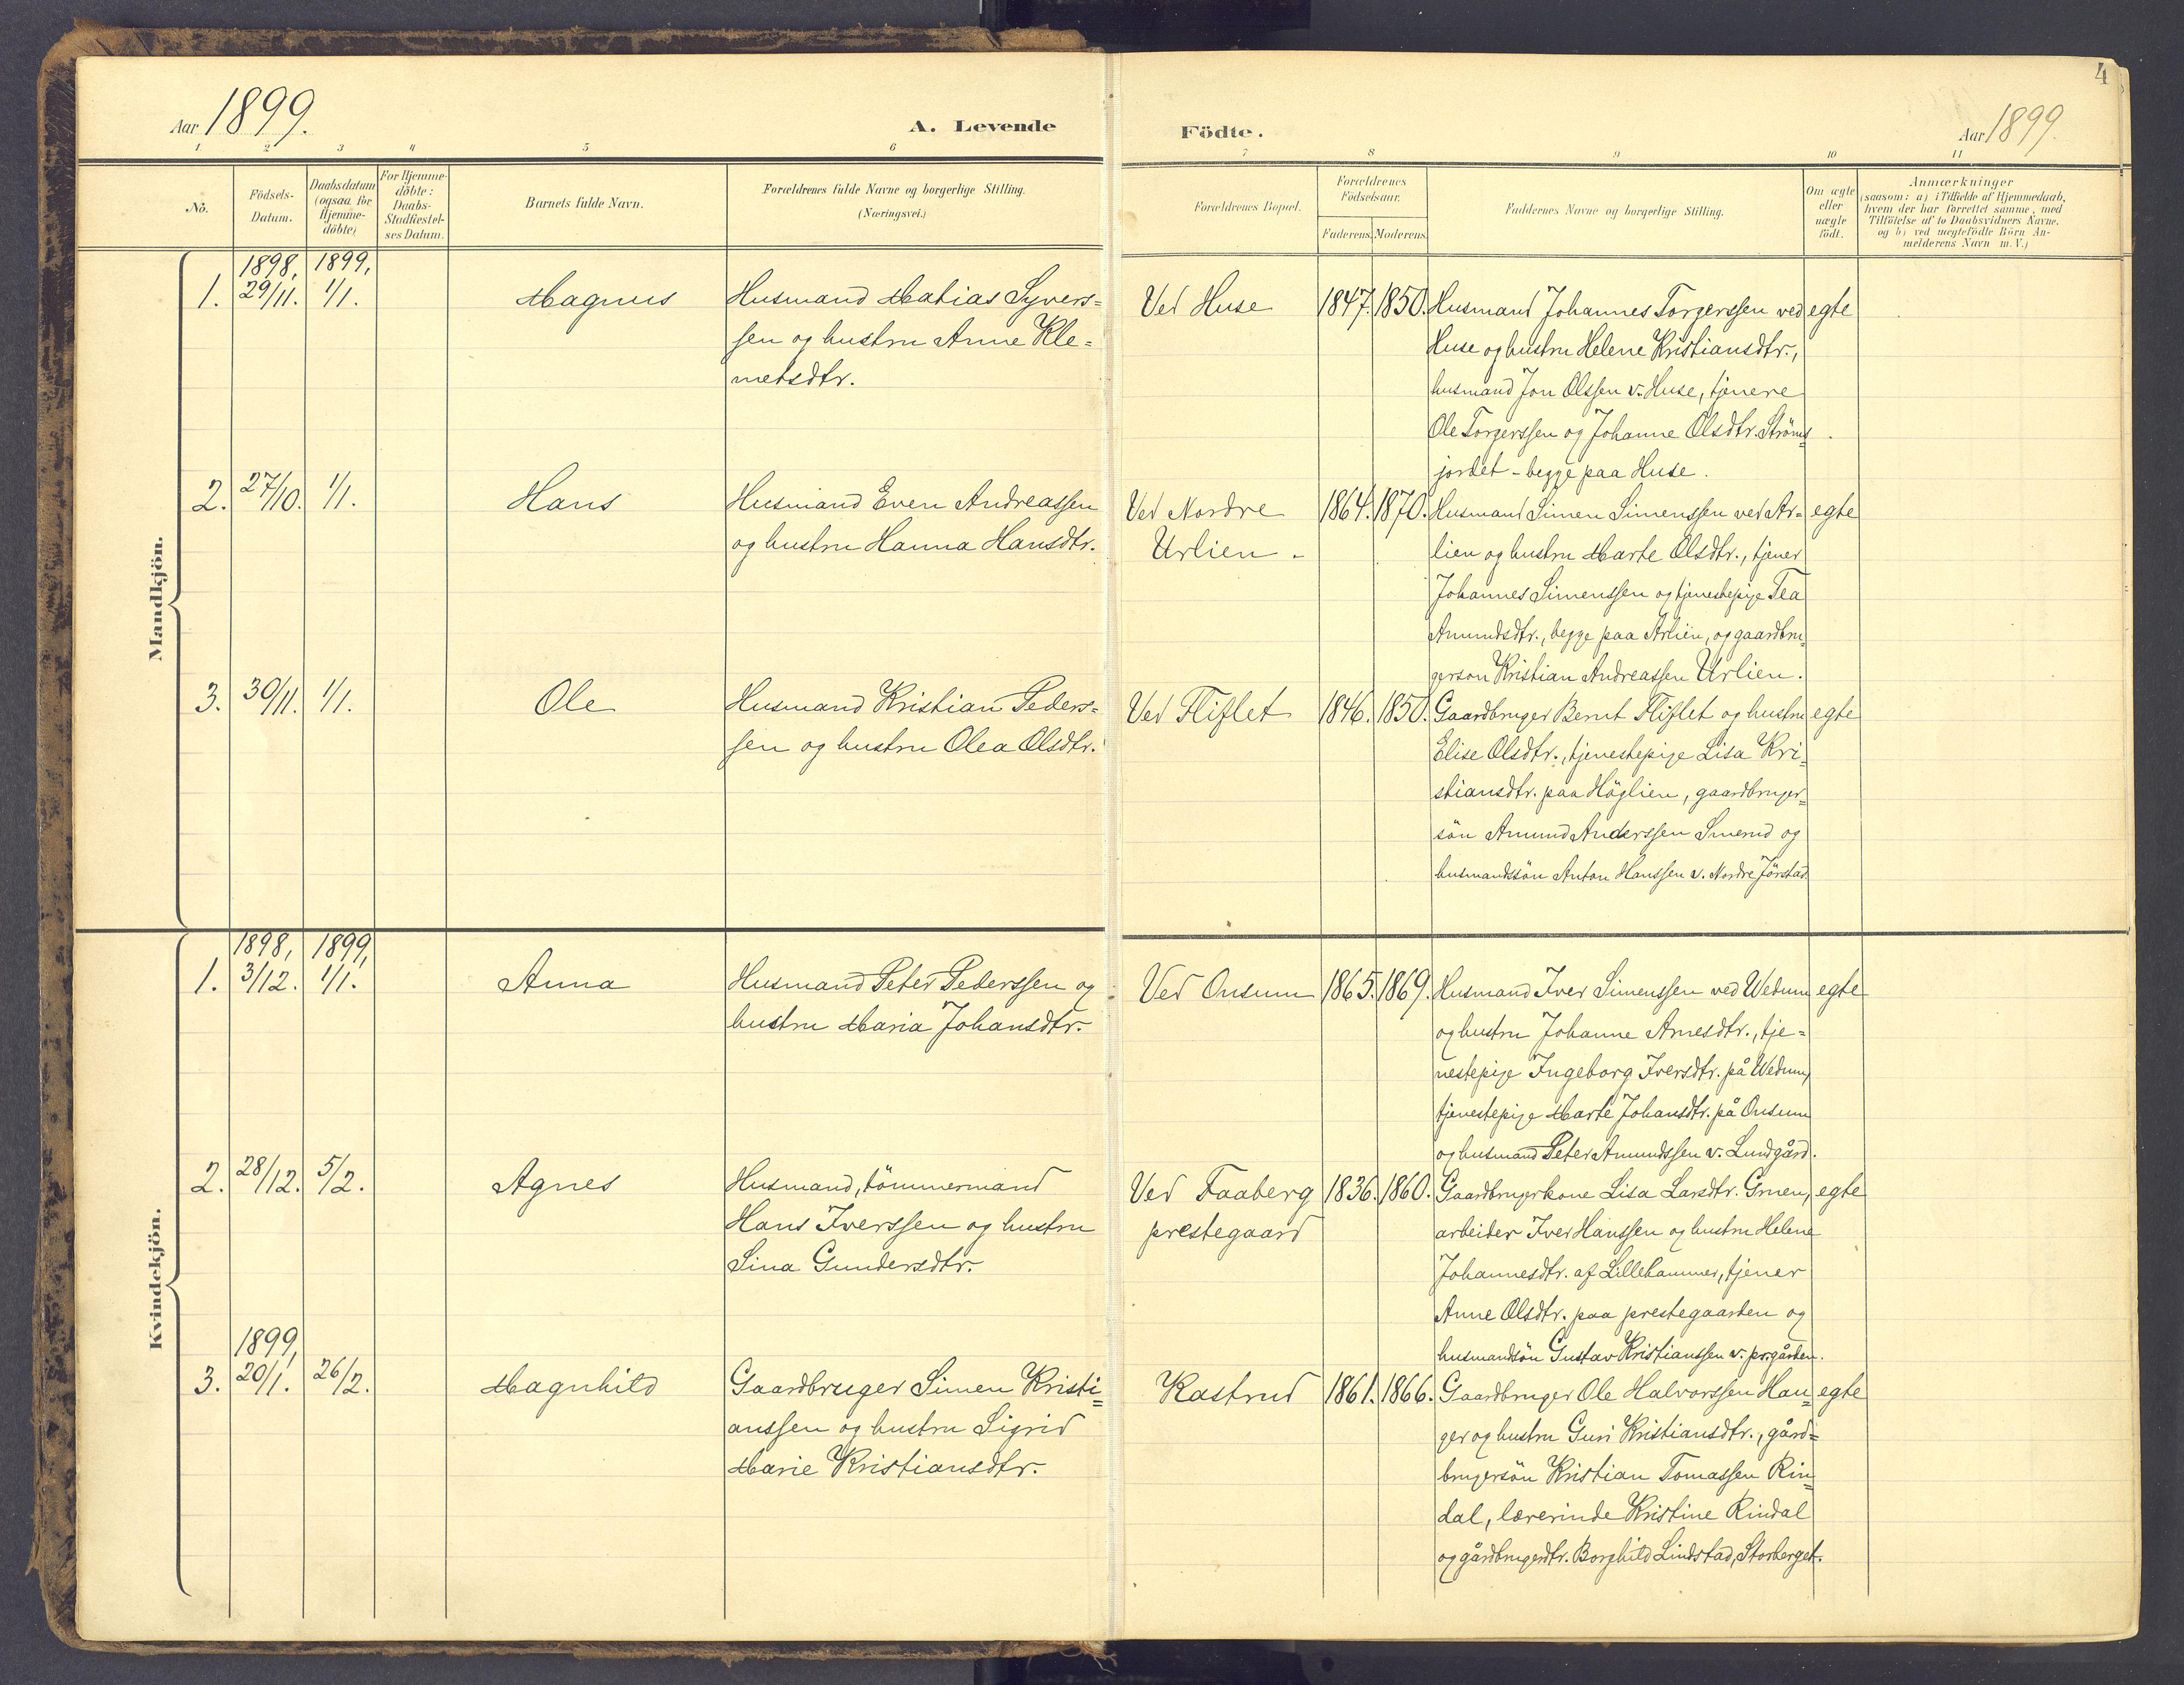 SAH, Fåberg prestekontor, Ministerialbok nr. 12, 1899-1915, s. 4